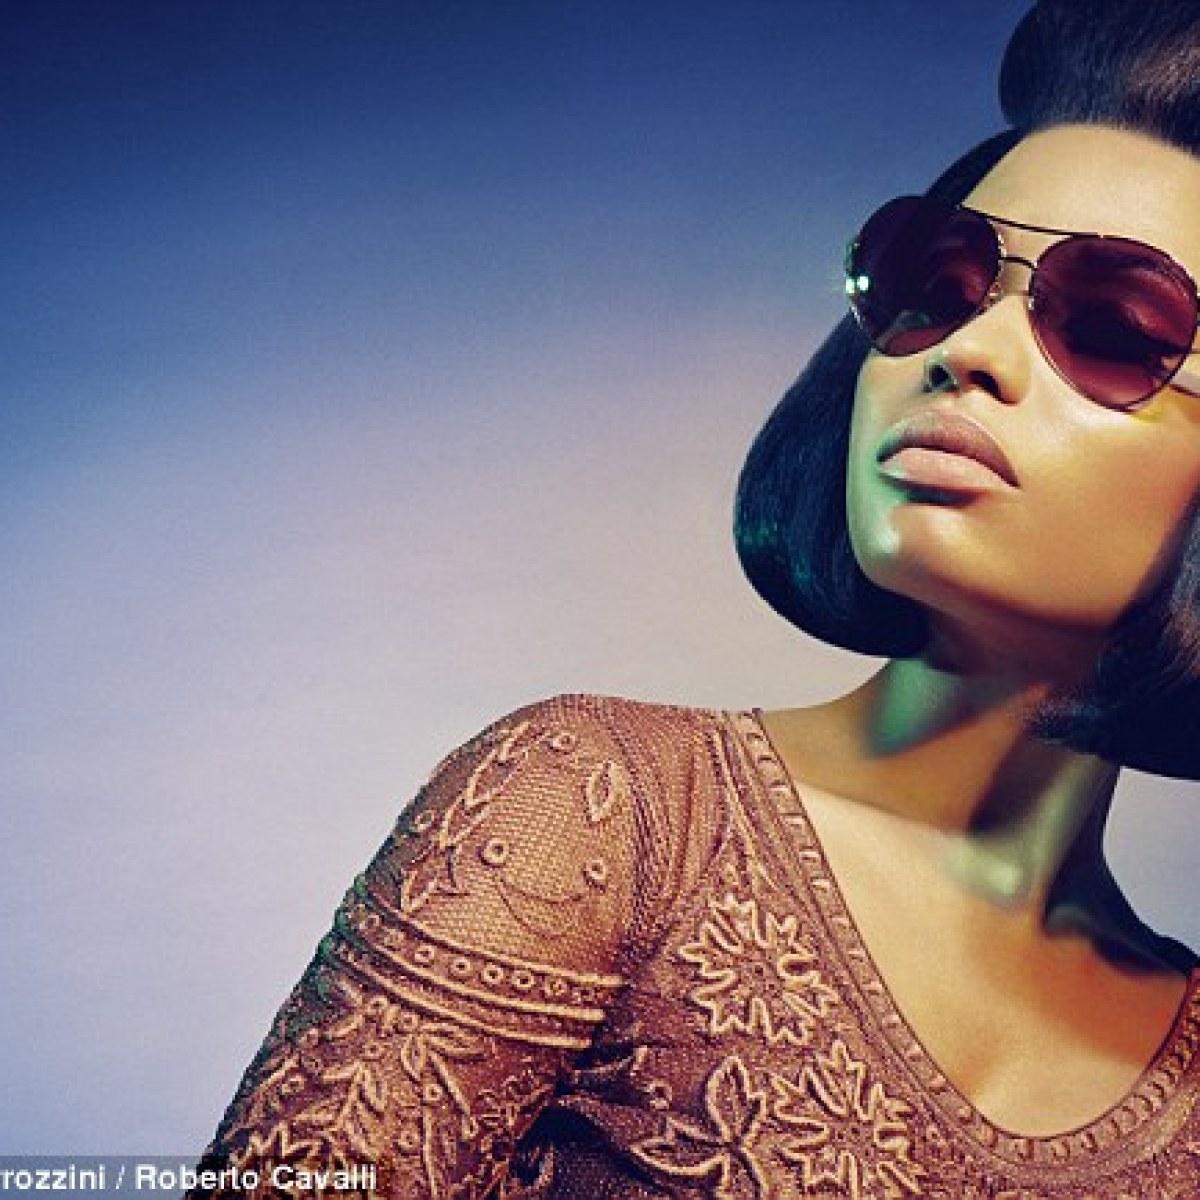 Nicki-Minaj-Roberto-Cavalli-Style-Stamped-7